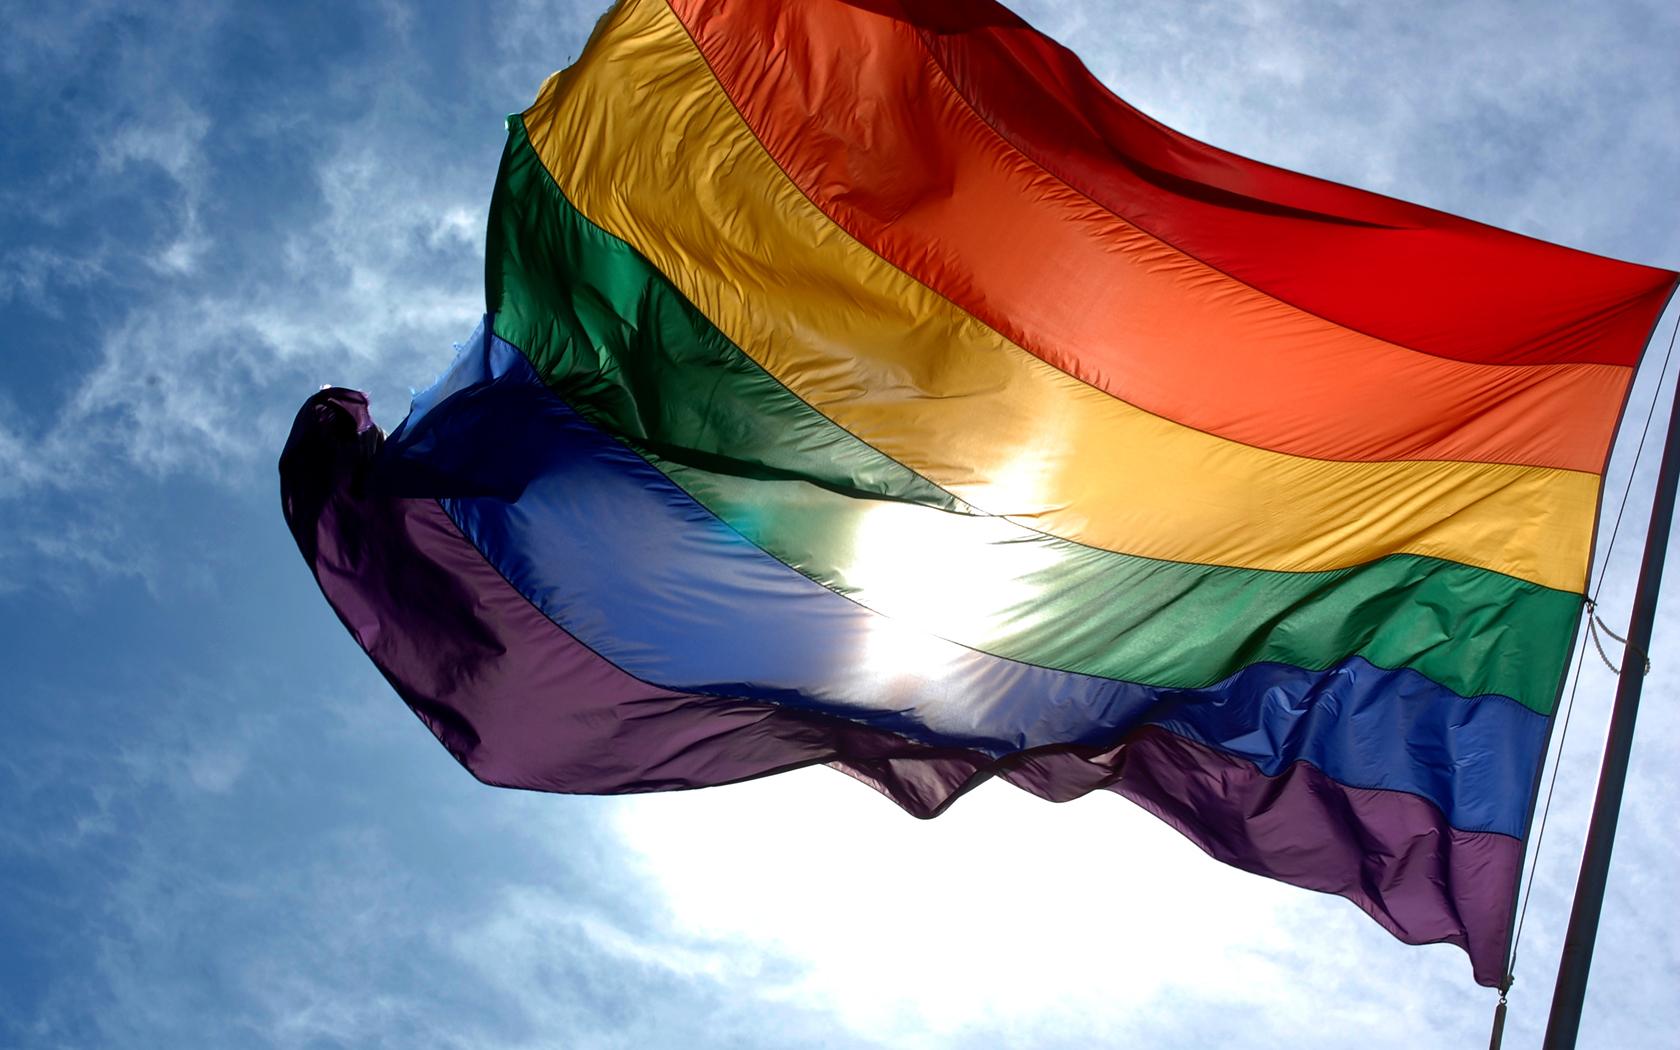 Gay Flags Wallpaper 1680x1050 Gay Flags Rainbows 1680x1050